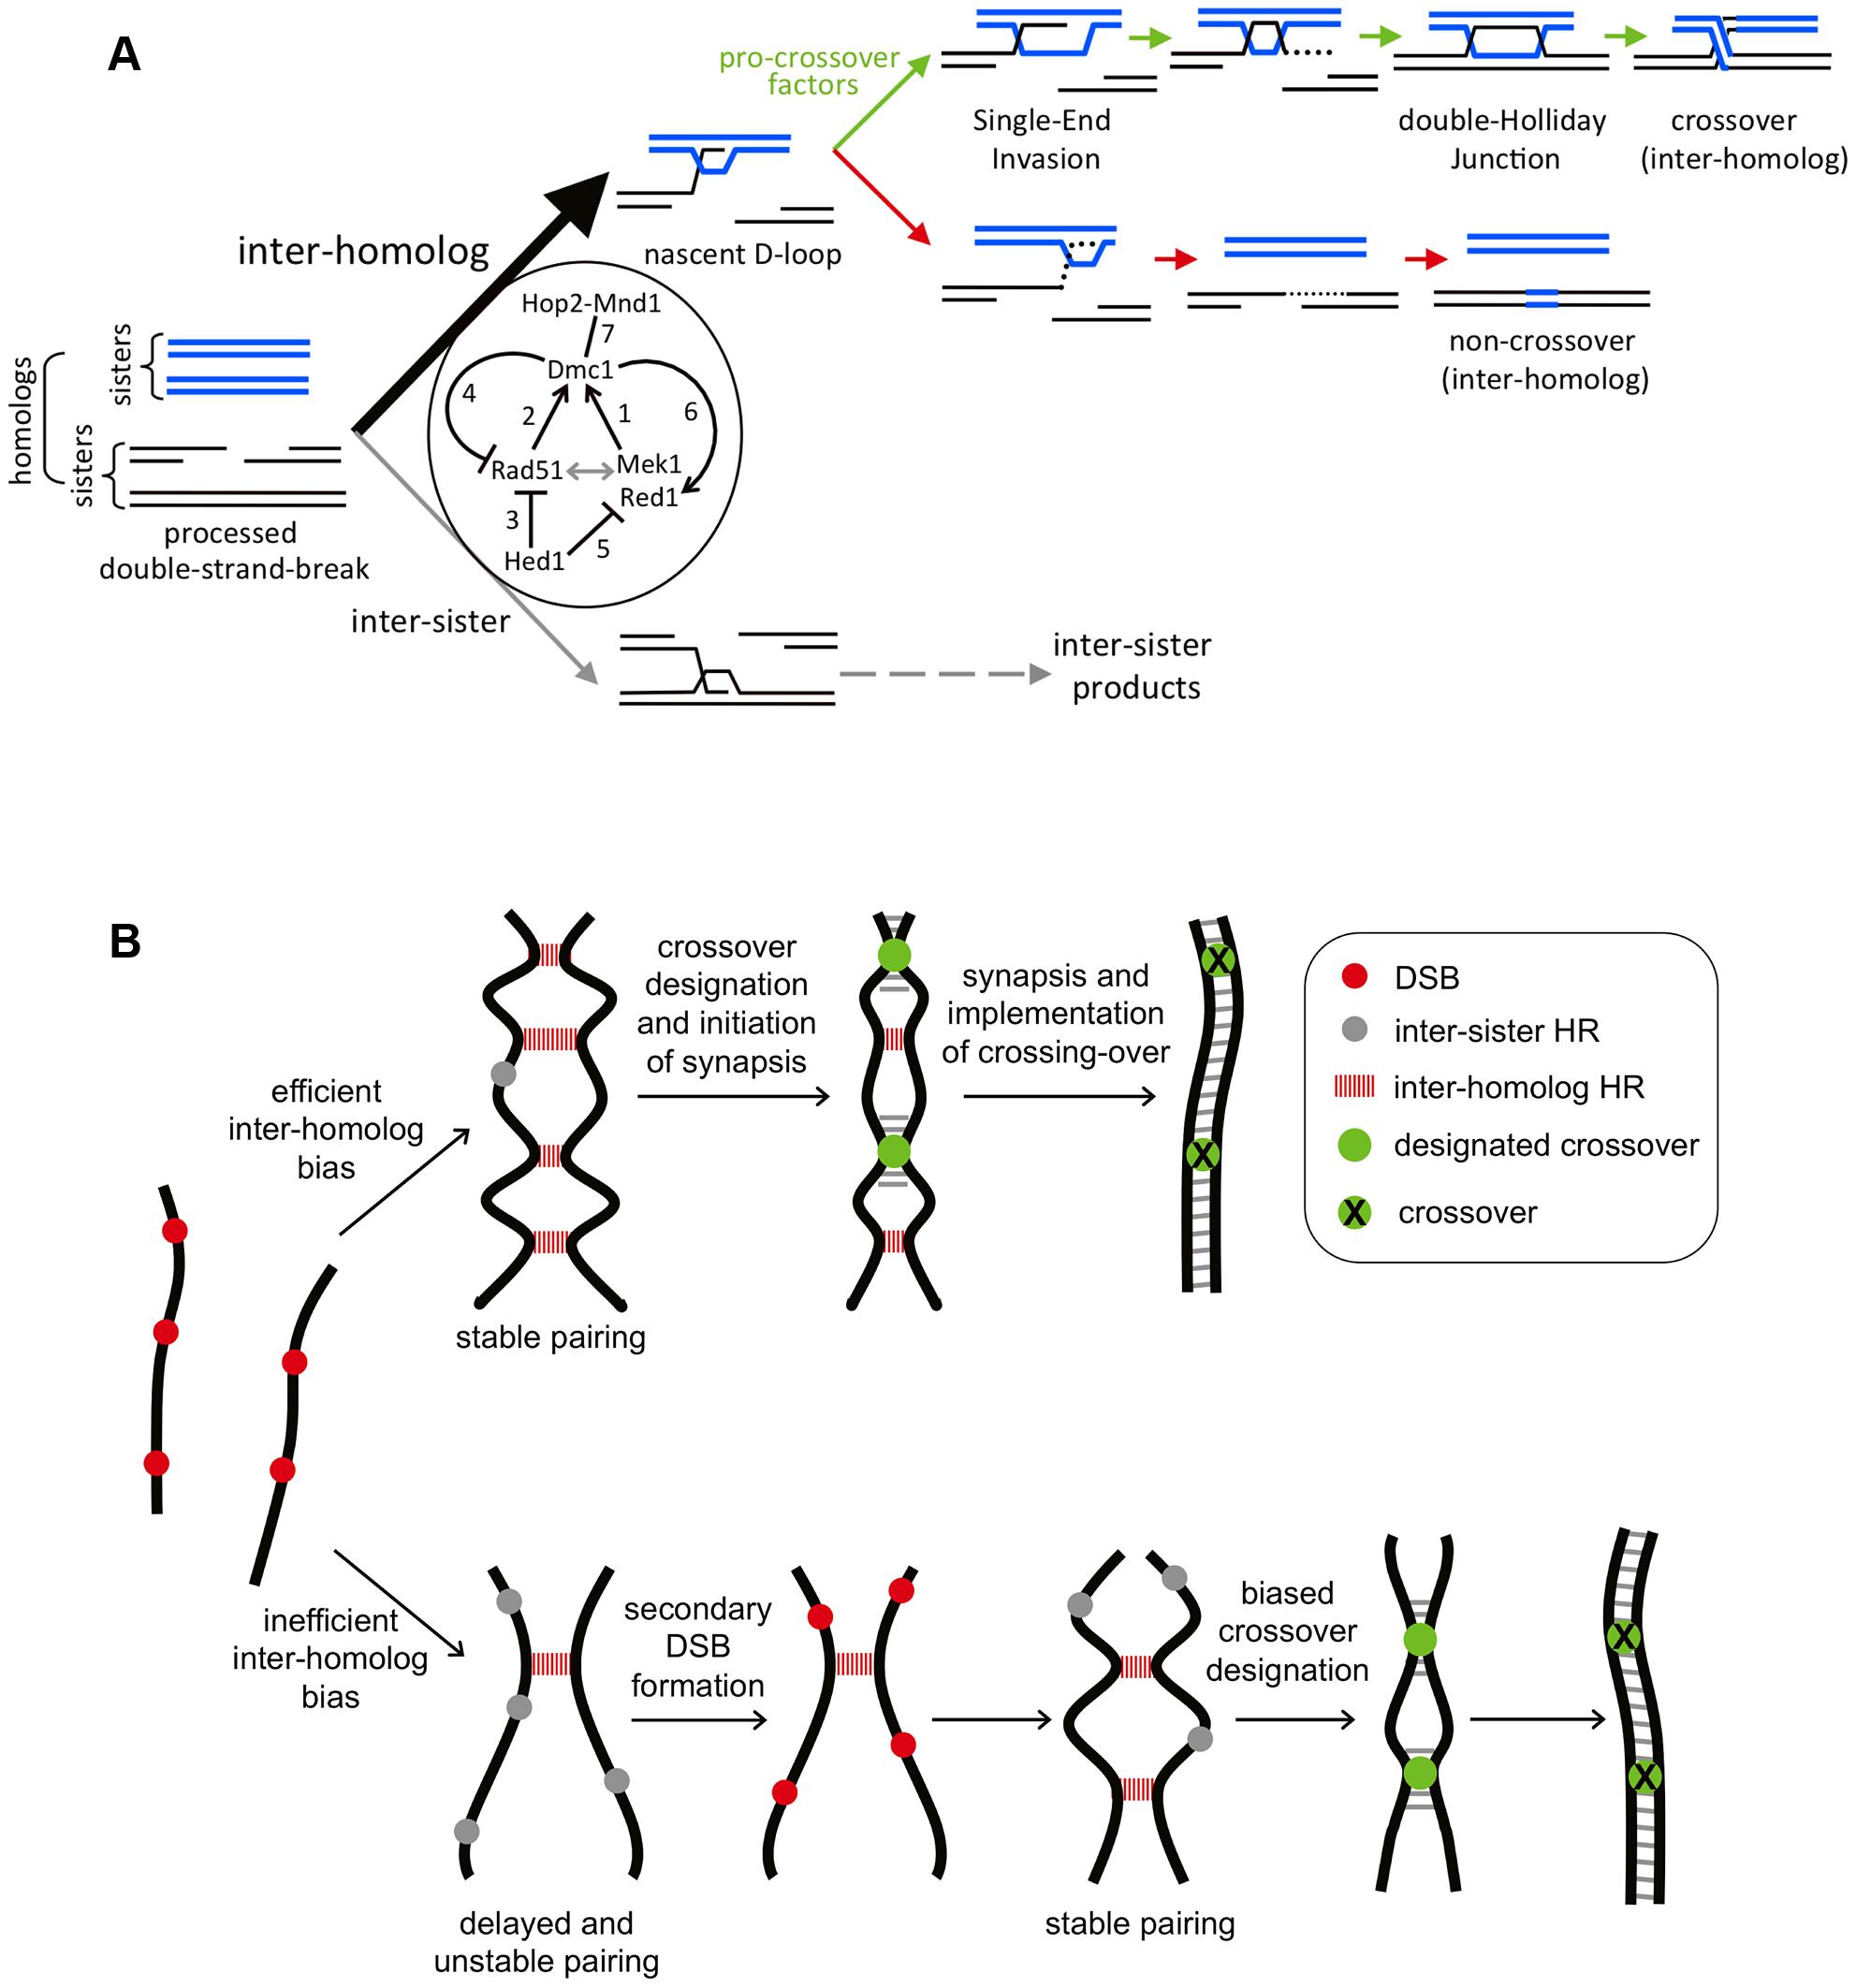 Models for Rad51-Dmc1 mediated interhomolog bias and homeostatic responses to inefficient interhomolog interactions.